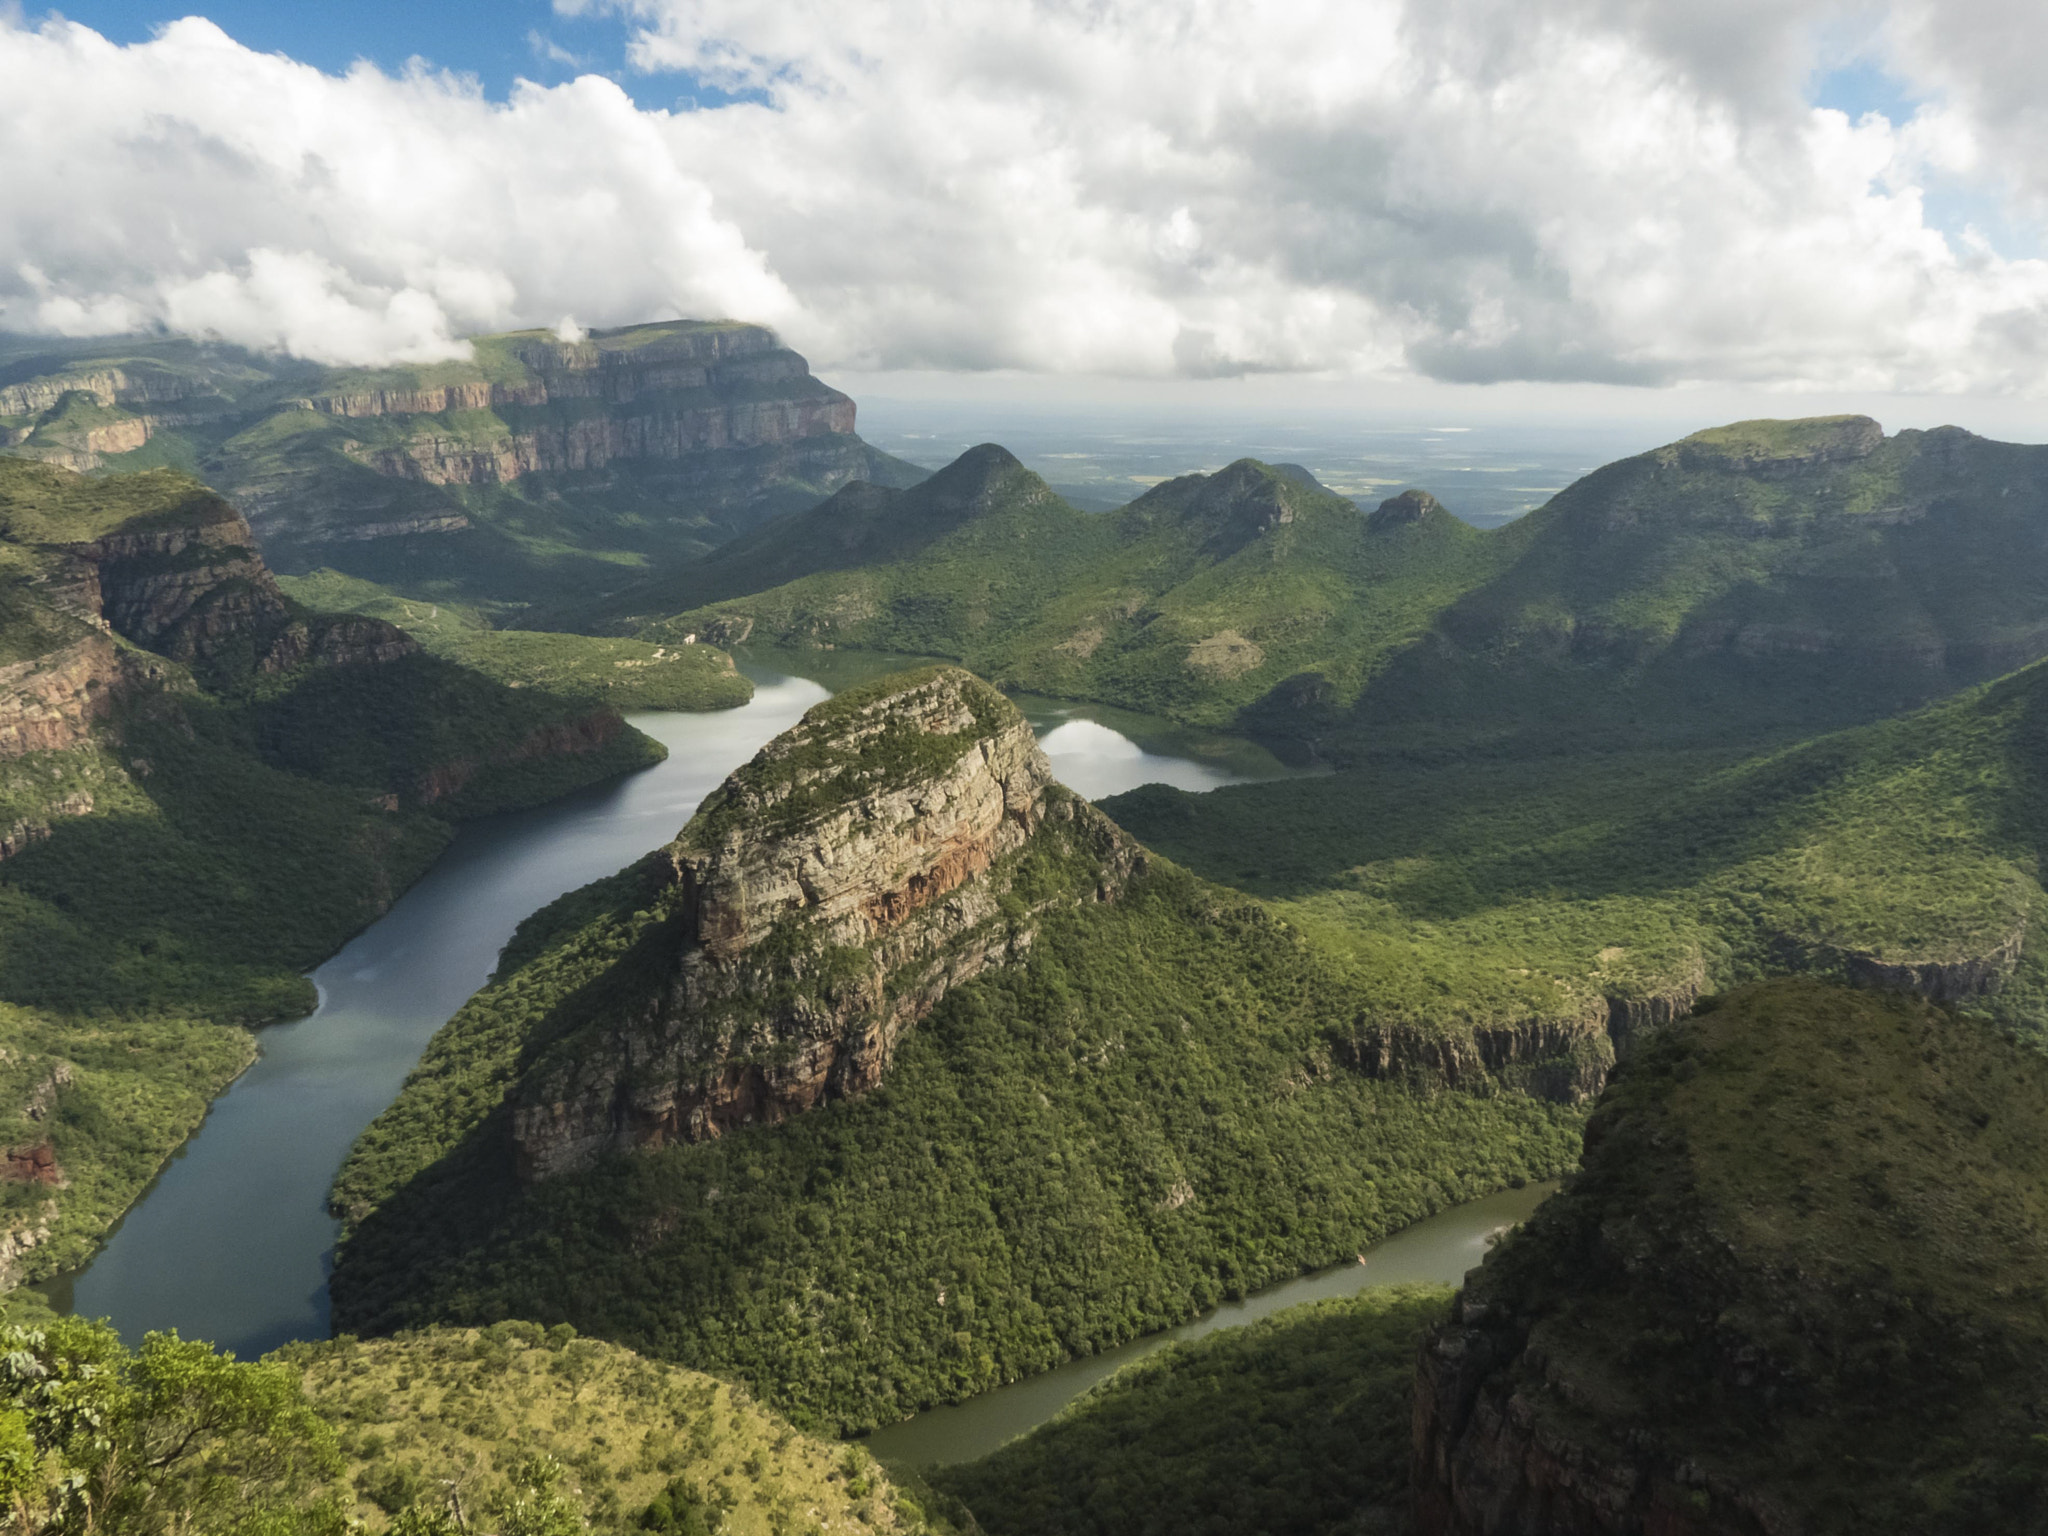 File:Blyde River Canyon (198812119).jpeg - Wikimedia Commons